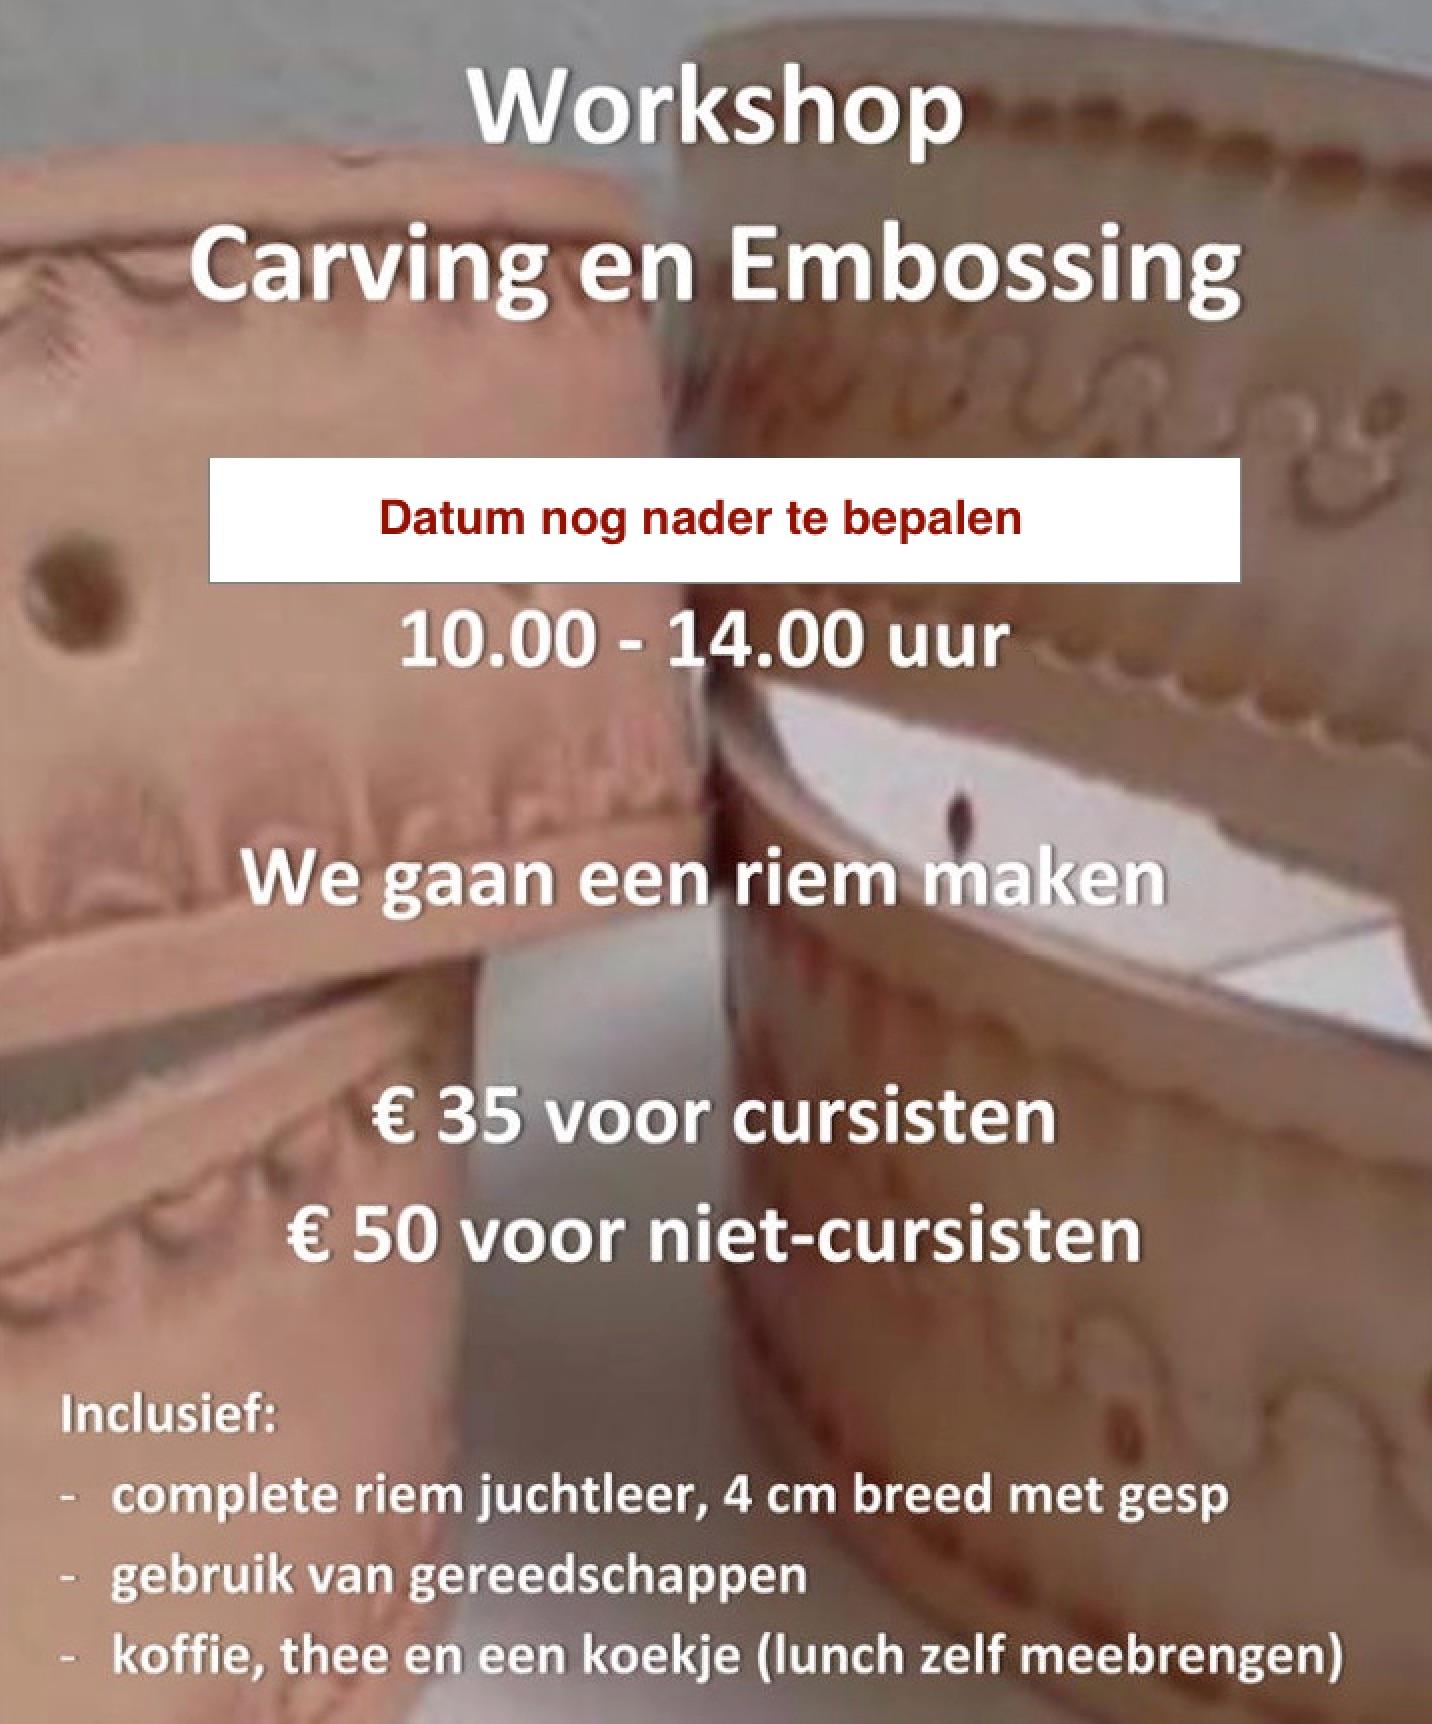 Workshop Carving embossing